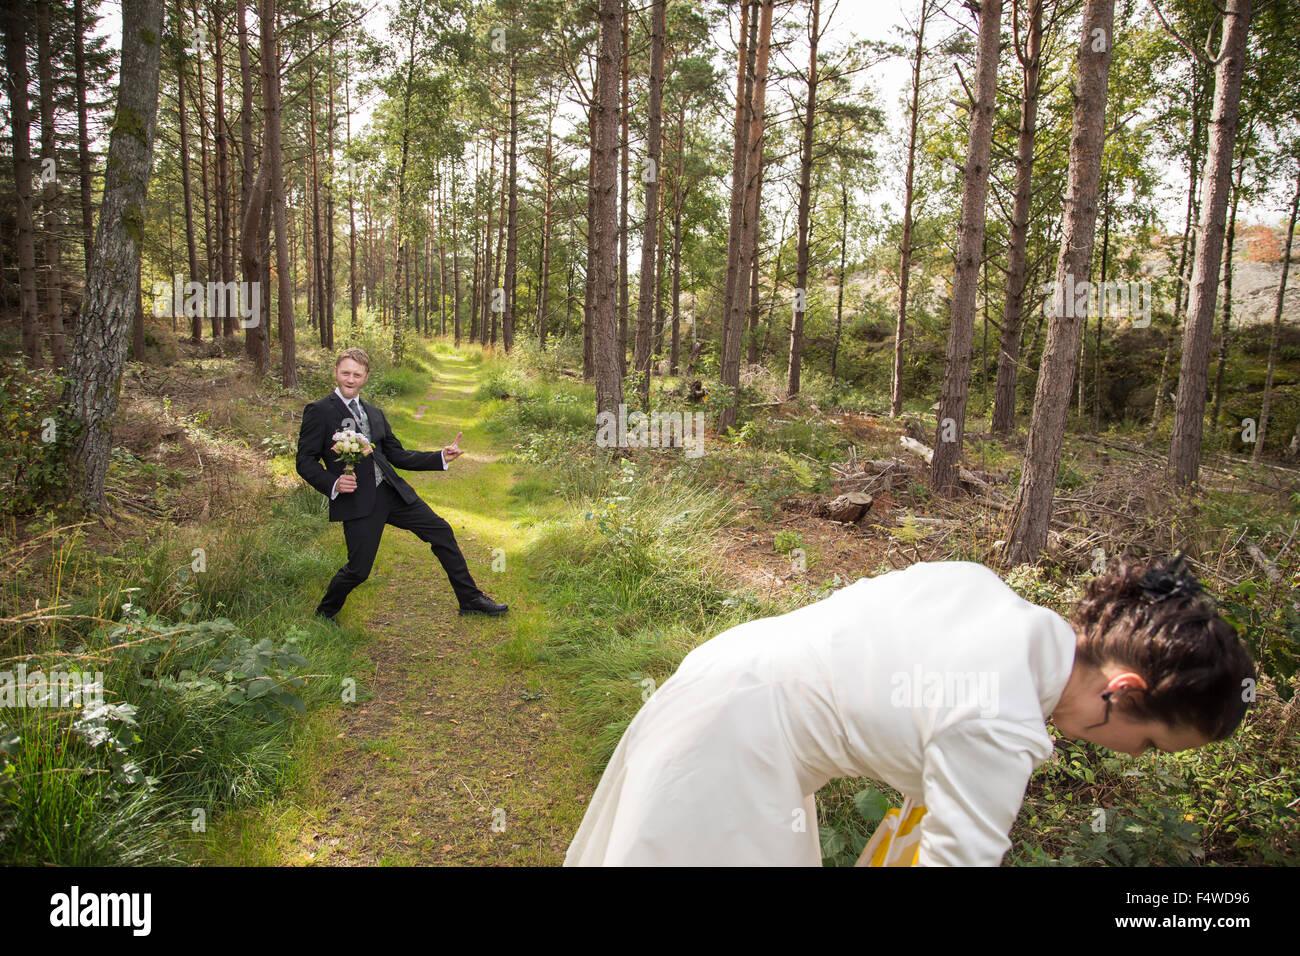 Sweden, Swedish West Coast, Bohuslan, Newly wed couple in forest - Stock Image